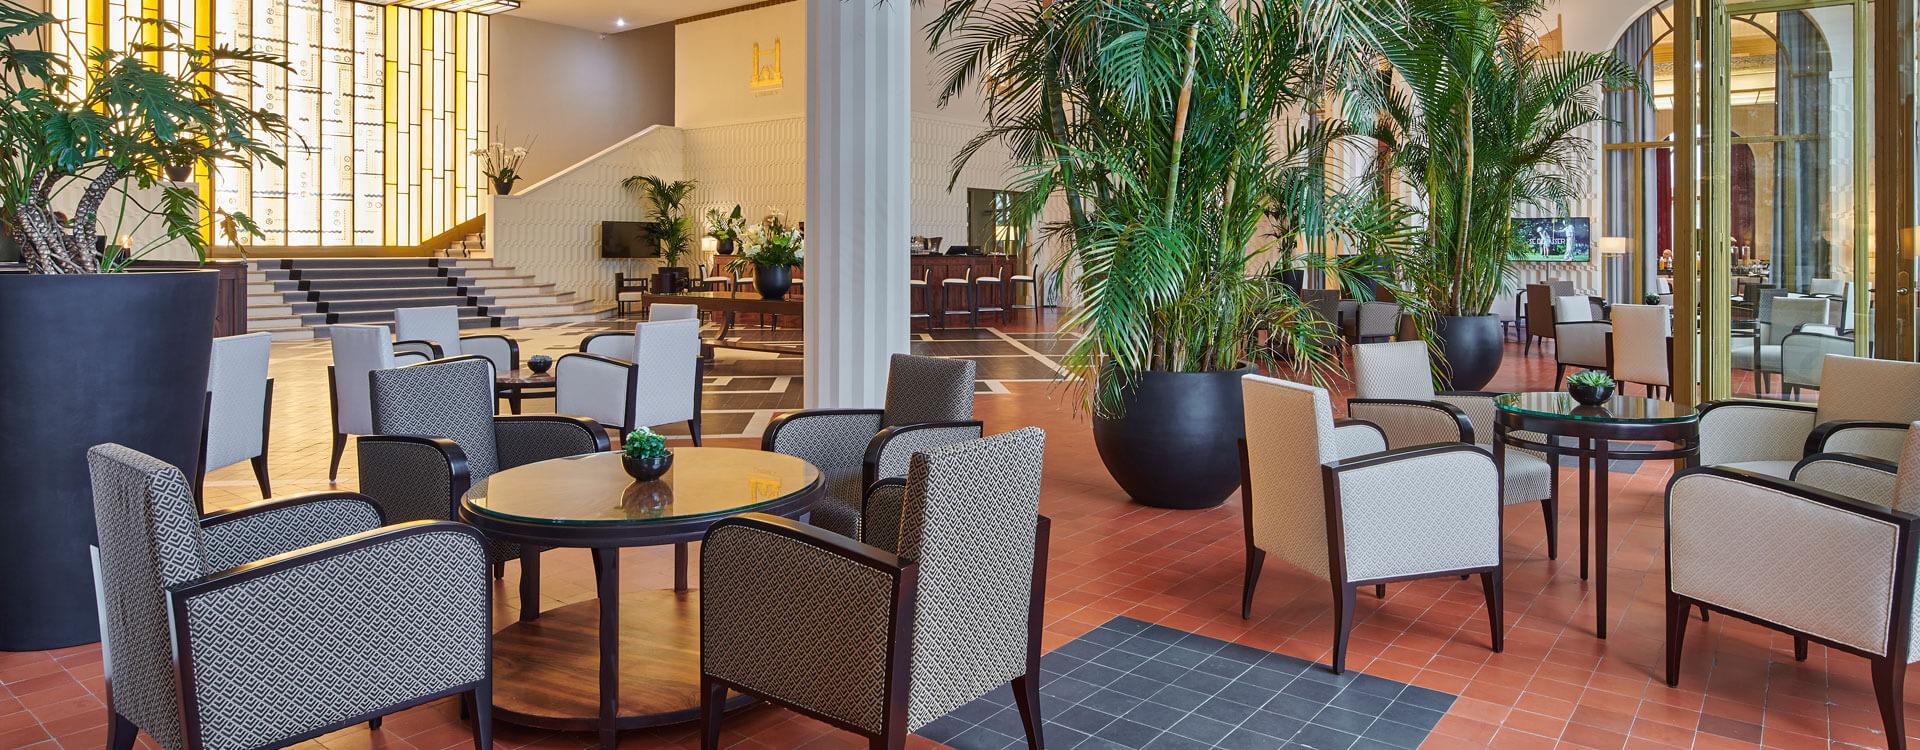 Hall - Hôtel et spa**** Splendid à Dax